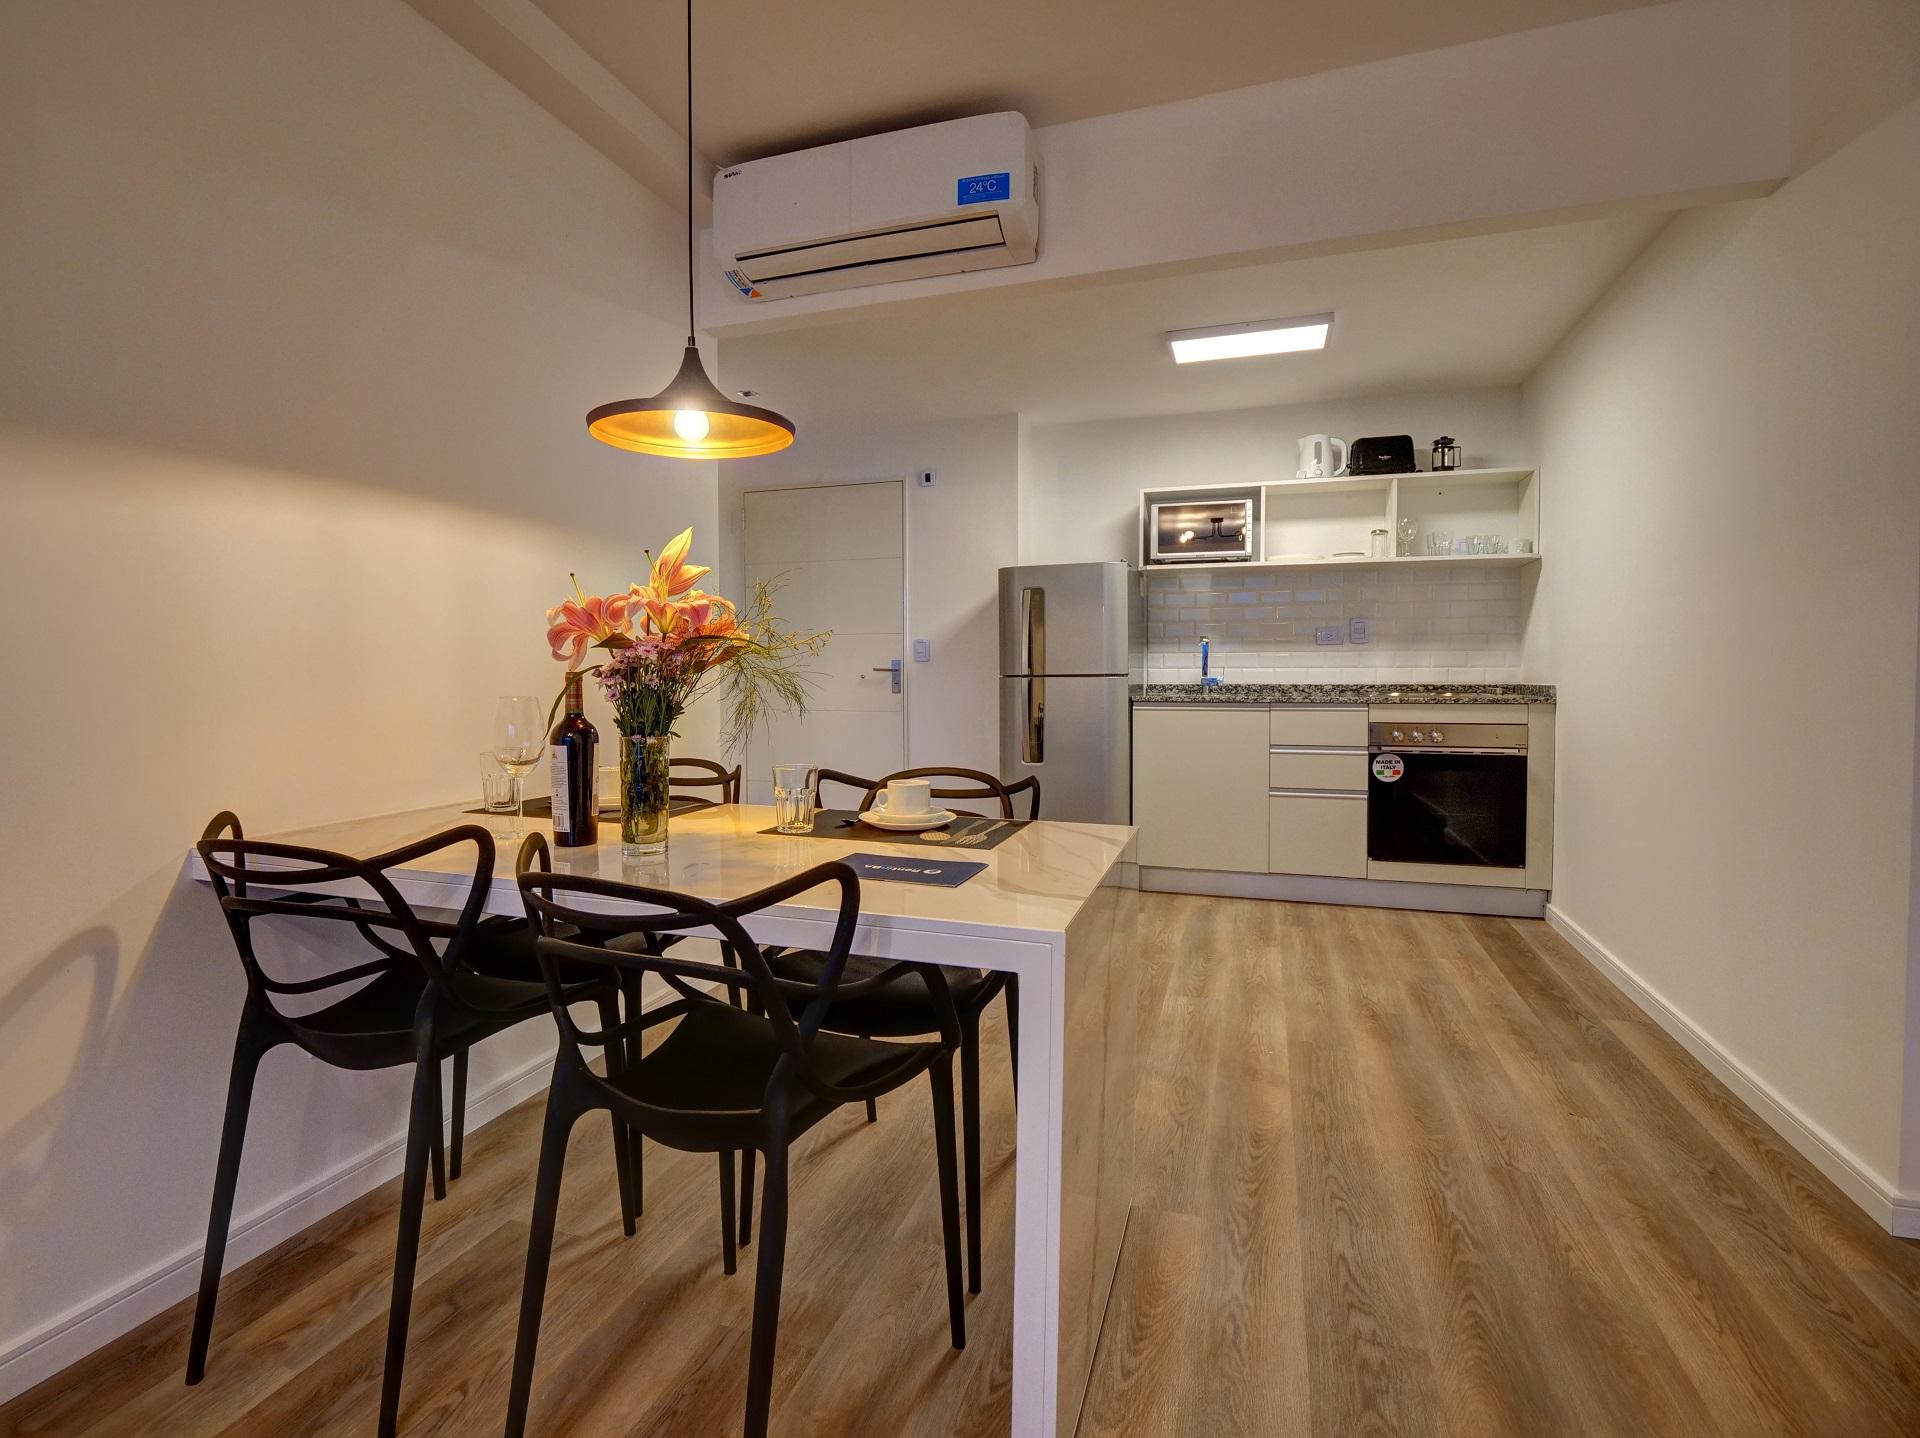 Kitchen at Bellini Esmeralda Apartments